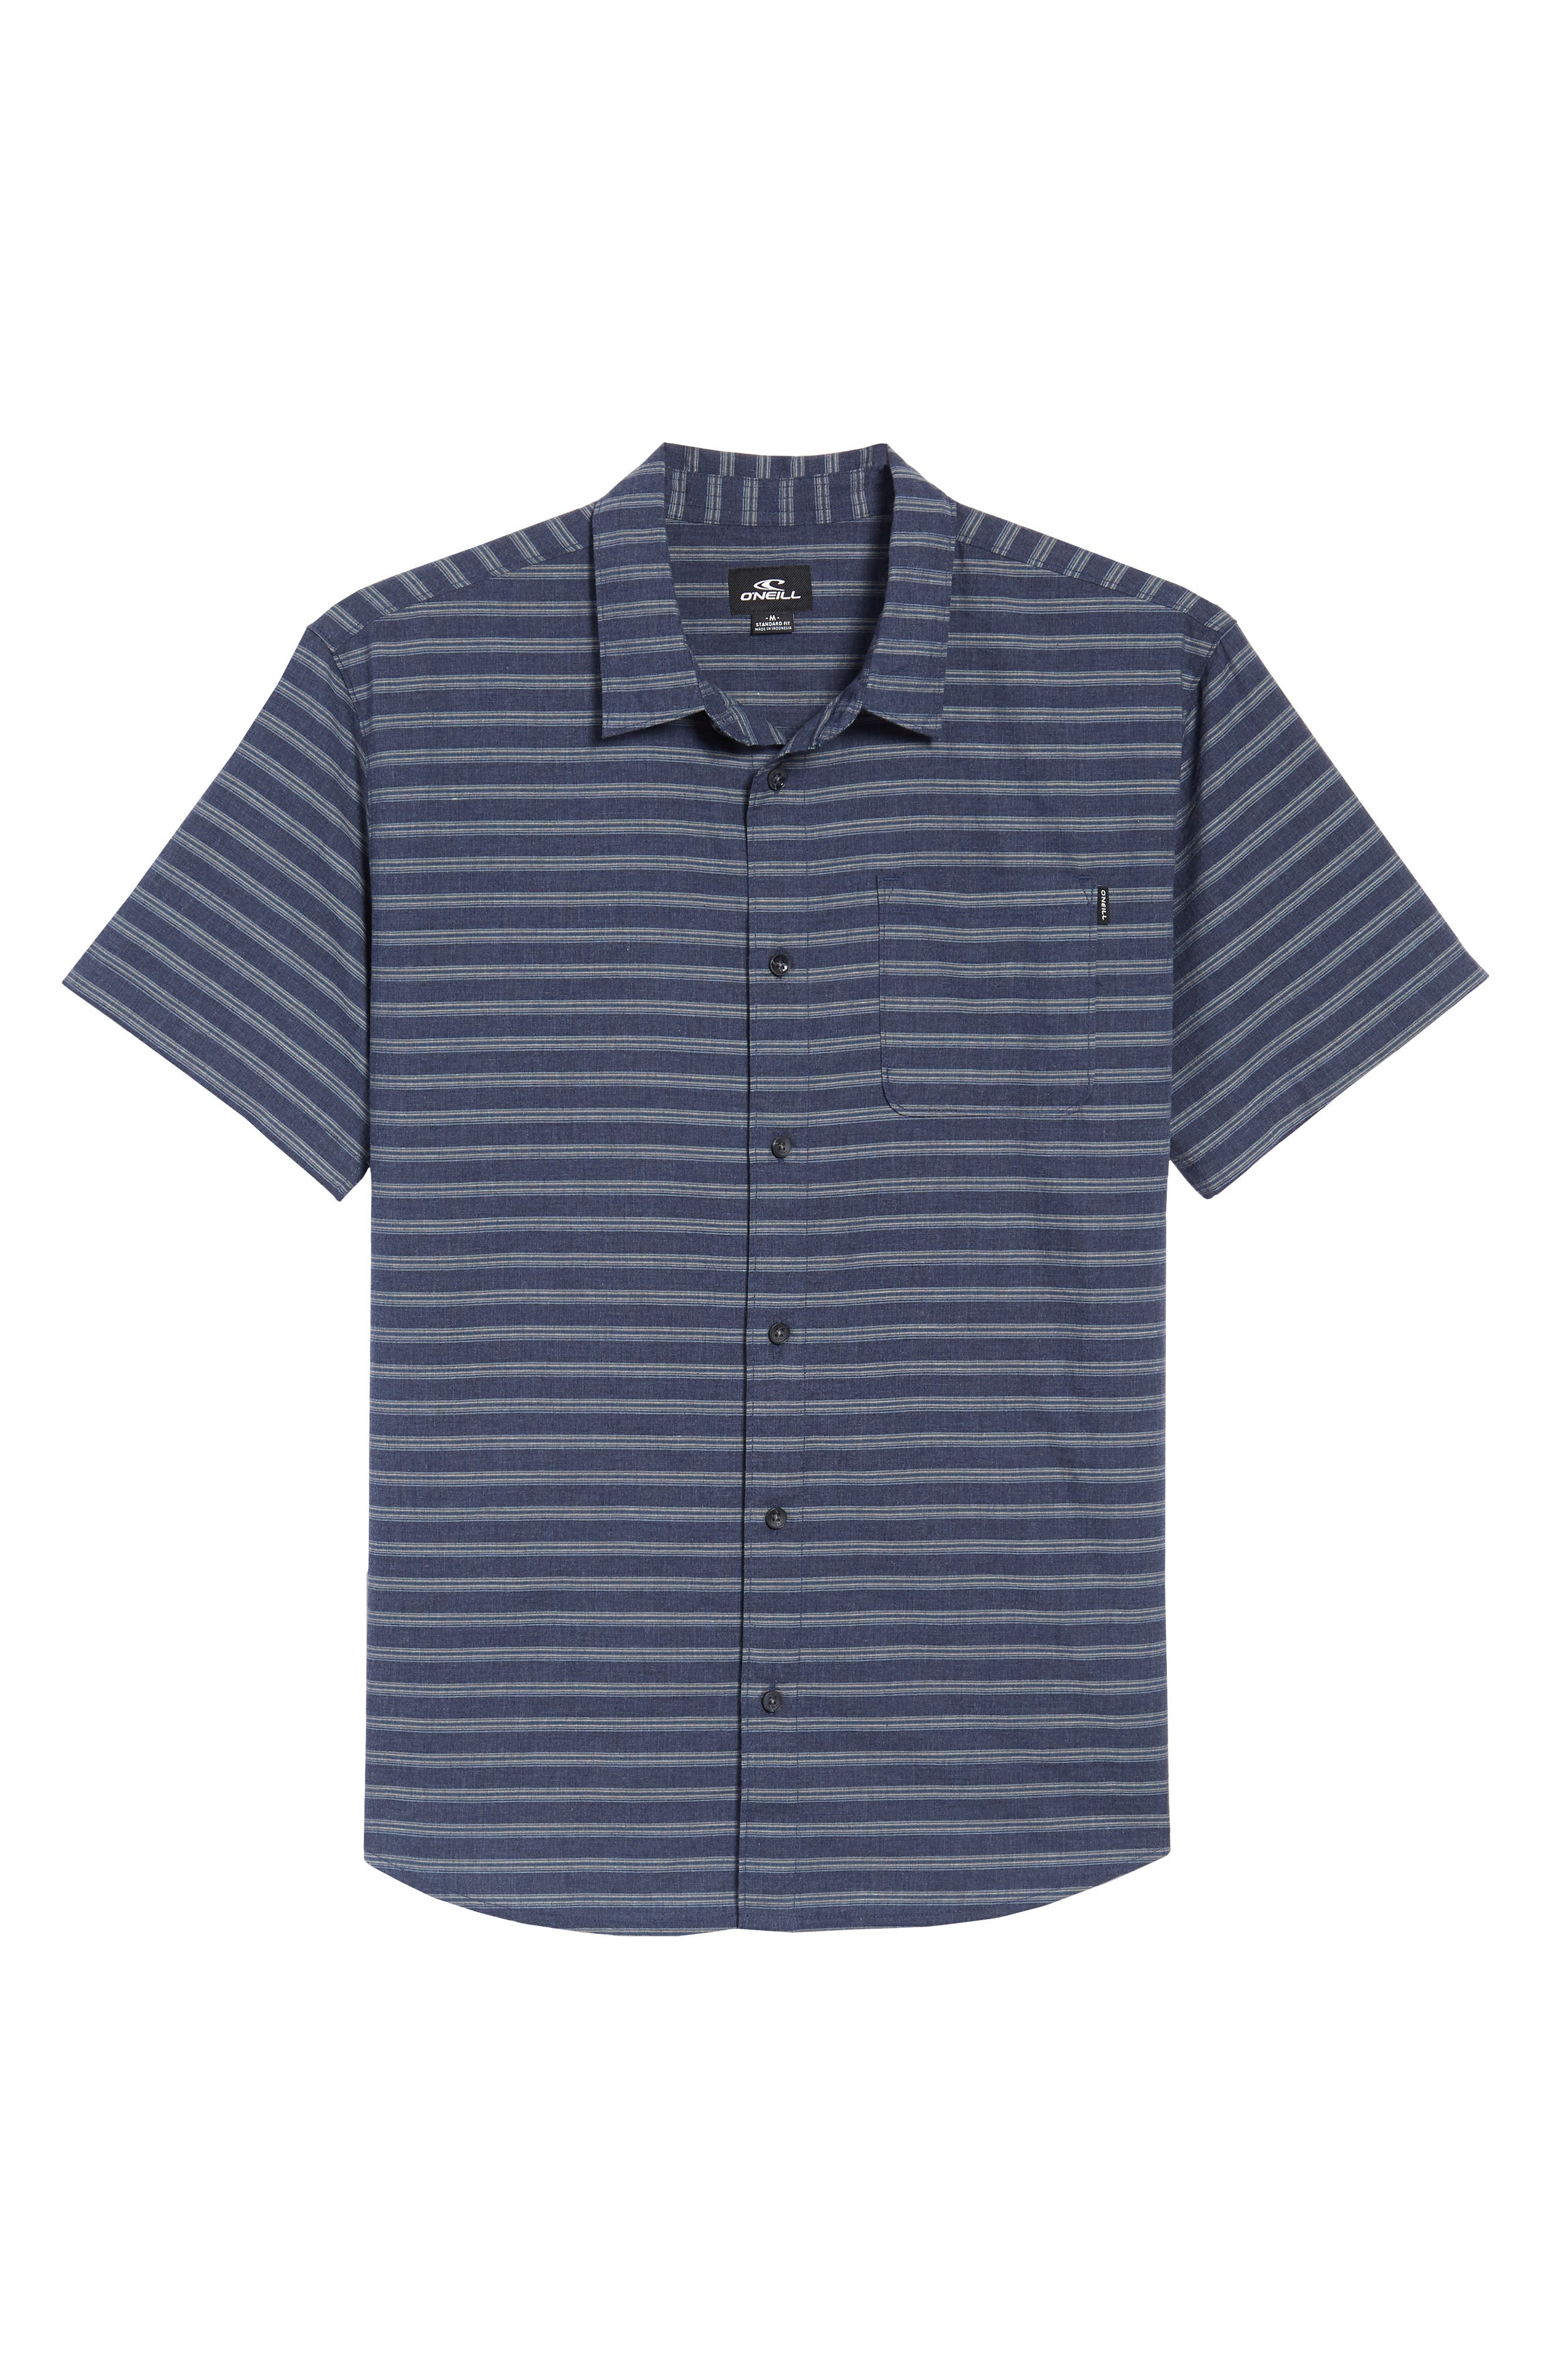 Stag Short Sleeve Shirt,                             Alternate thumbnail 6, color,